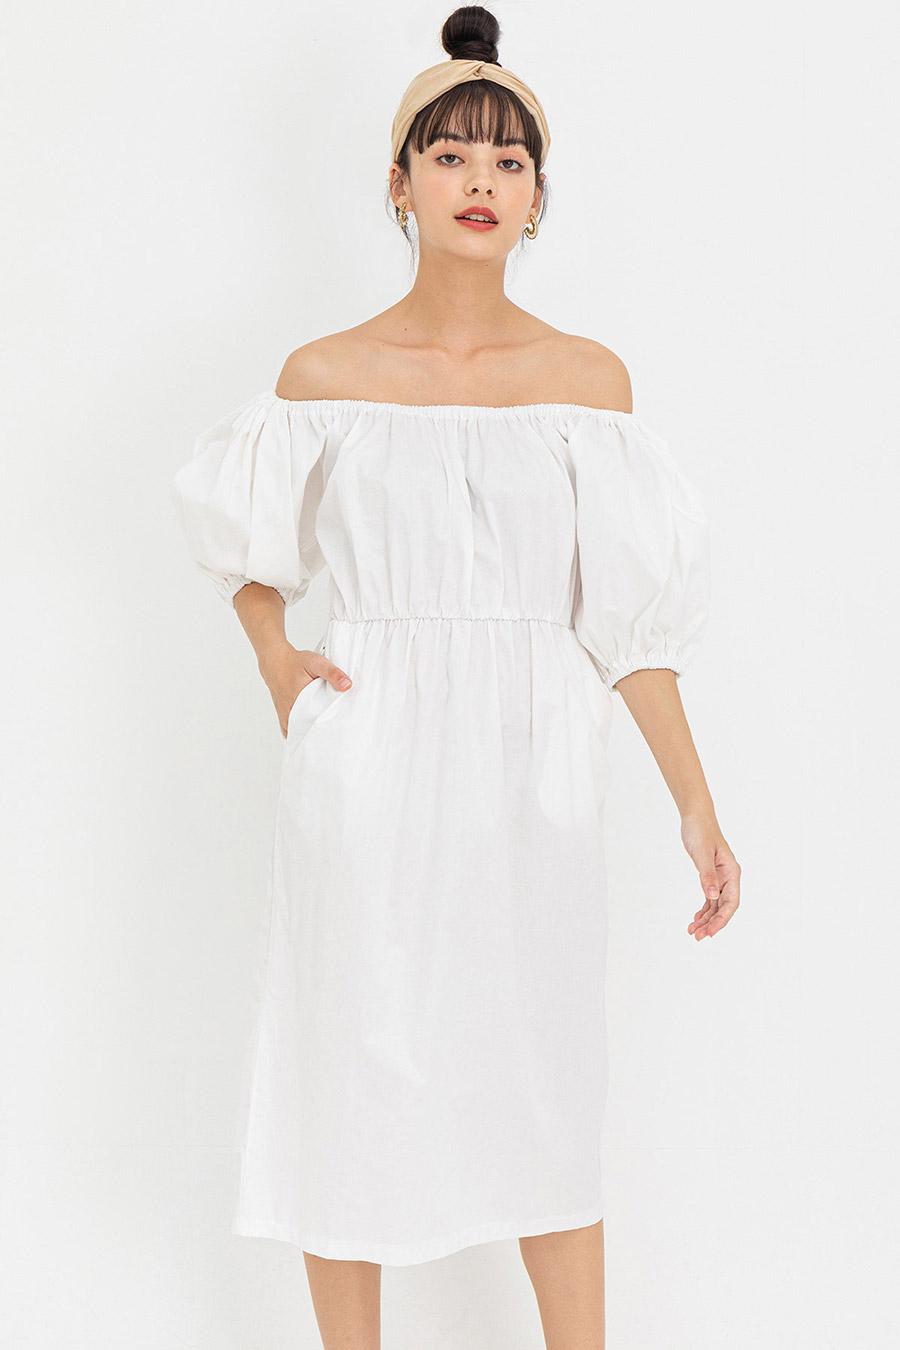 RENEE DRESS - IVORY